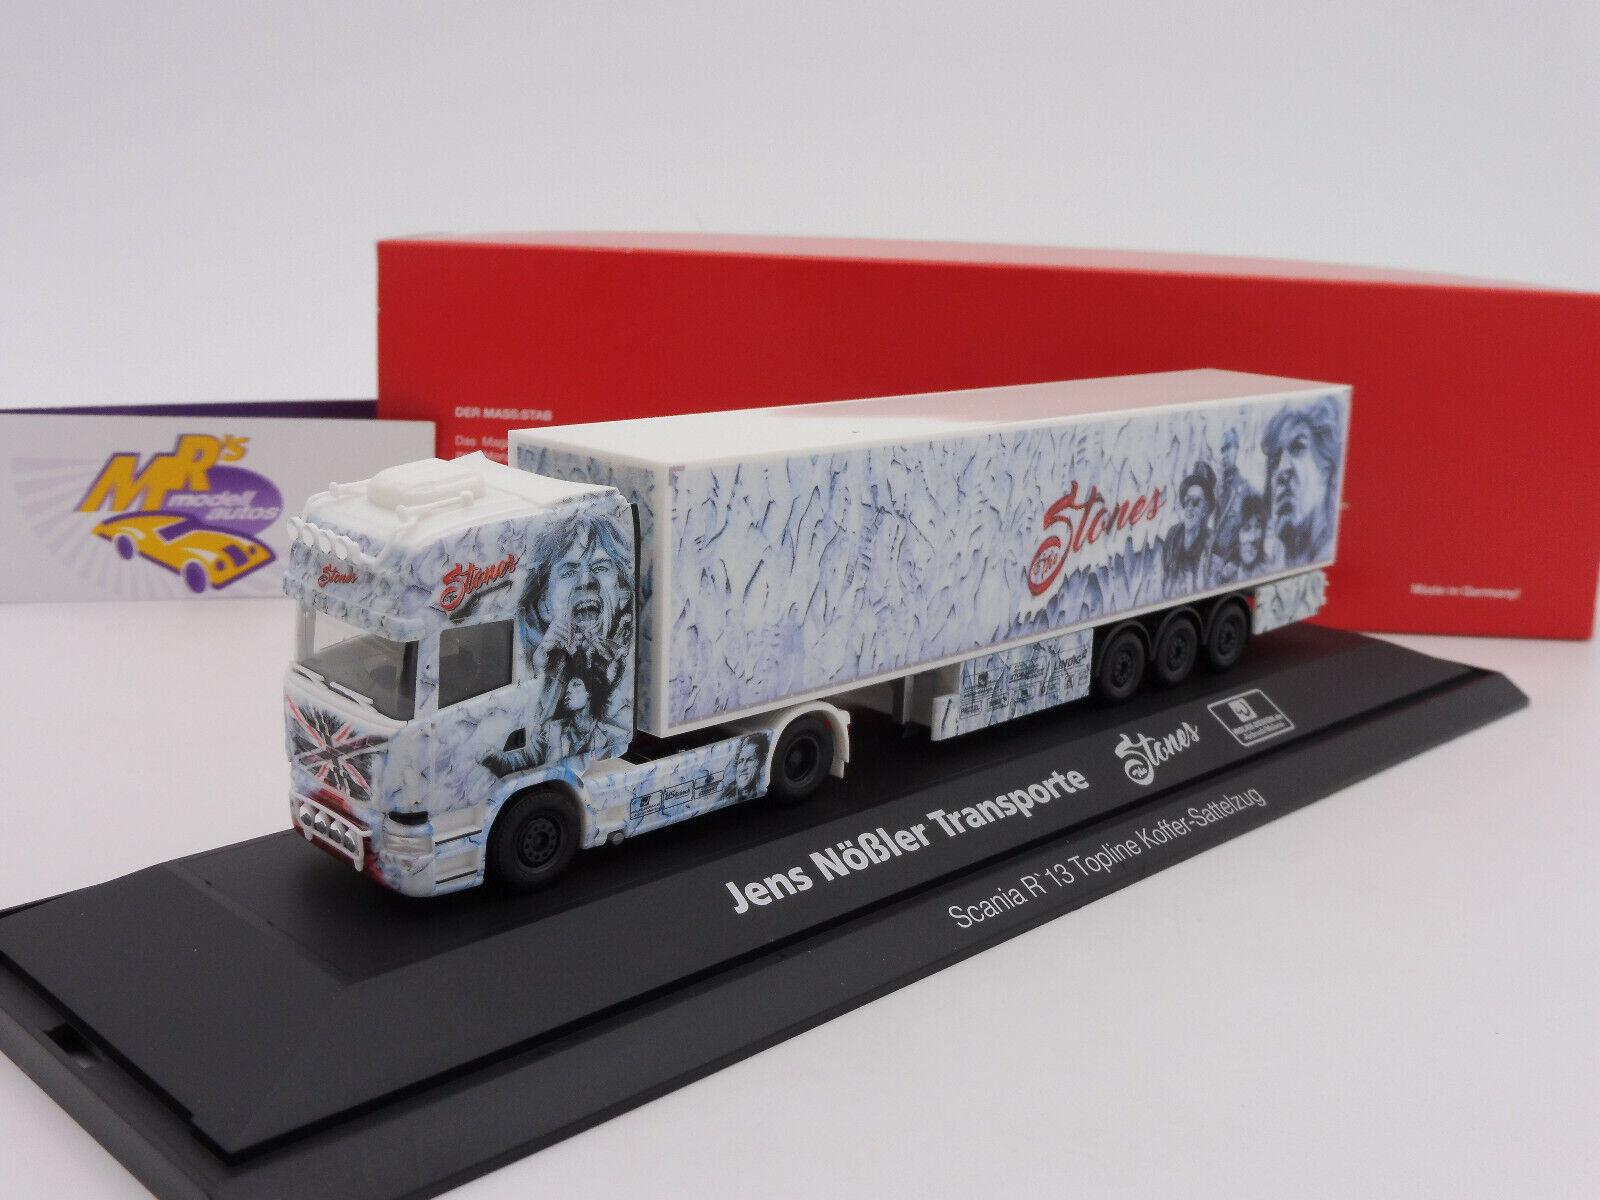 Herpa 121958   Scania R TL valise-Semi-remorque  THE STONES-J. nößler  1 87 NEUF